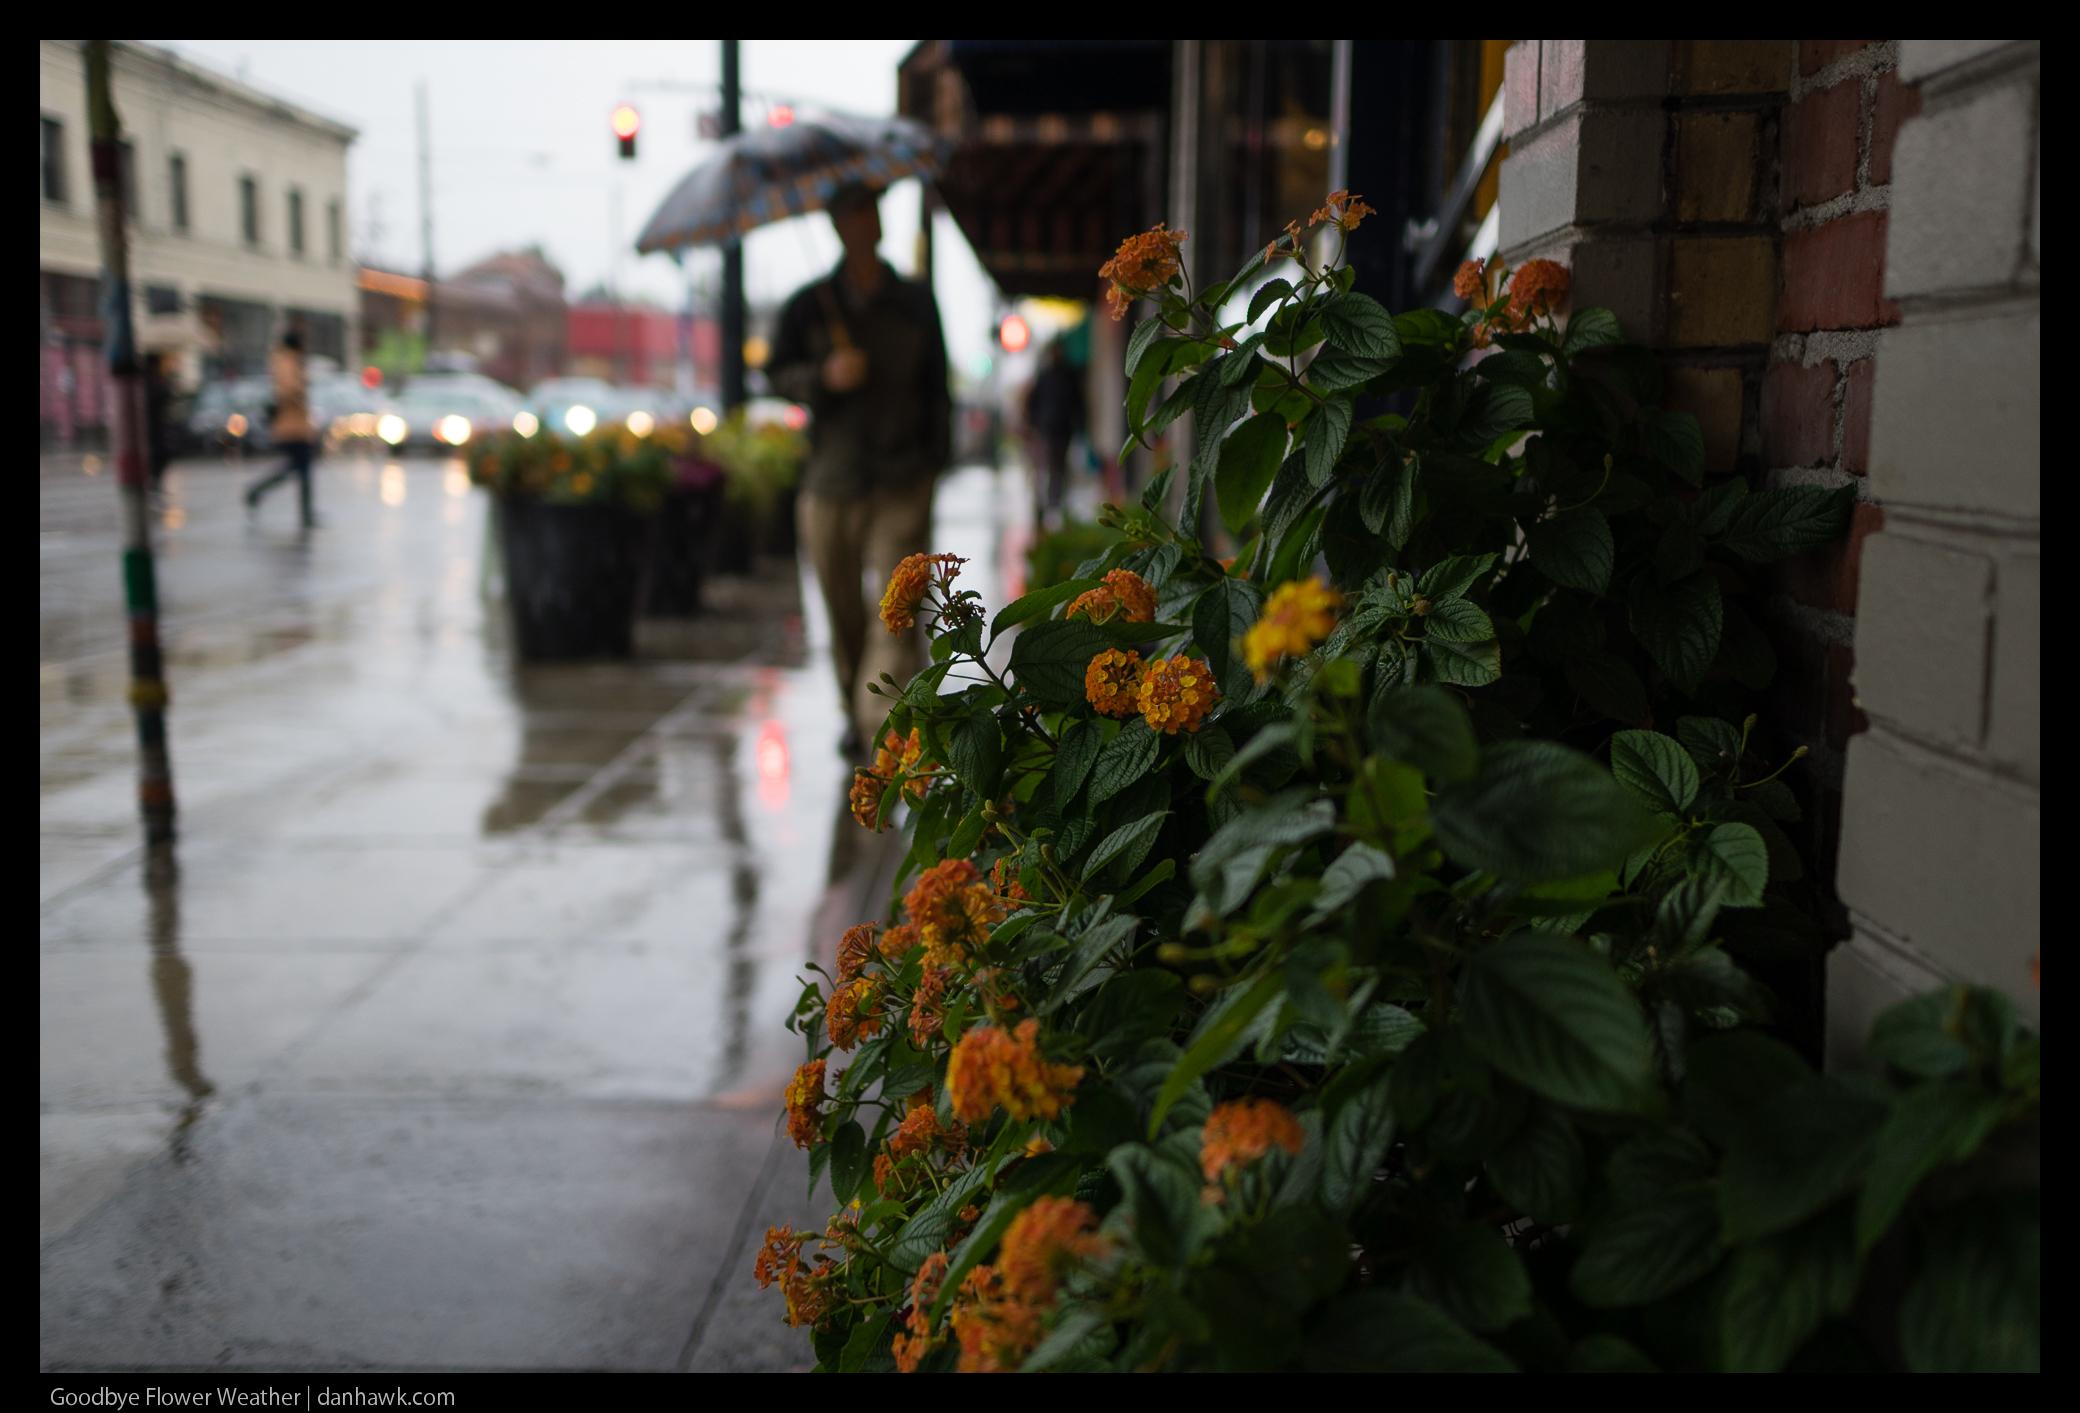 Goodbye Flower Weather